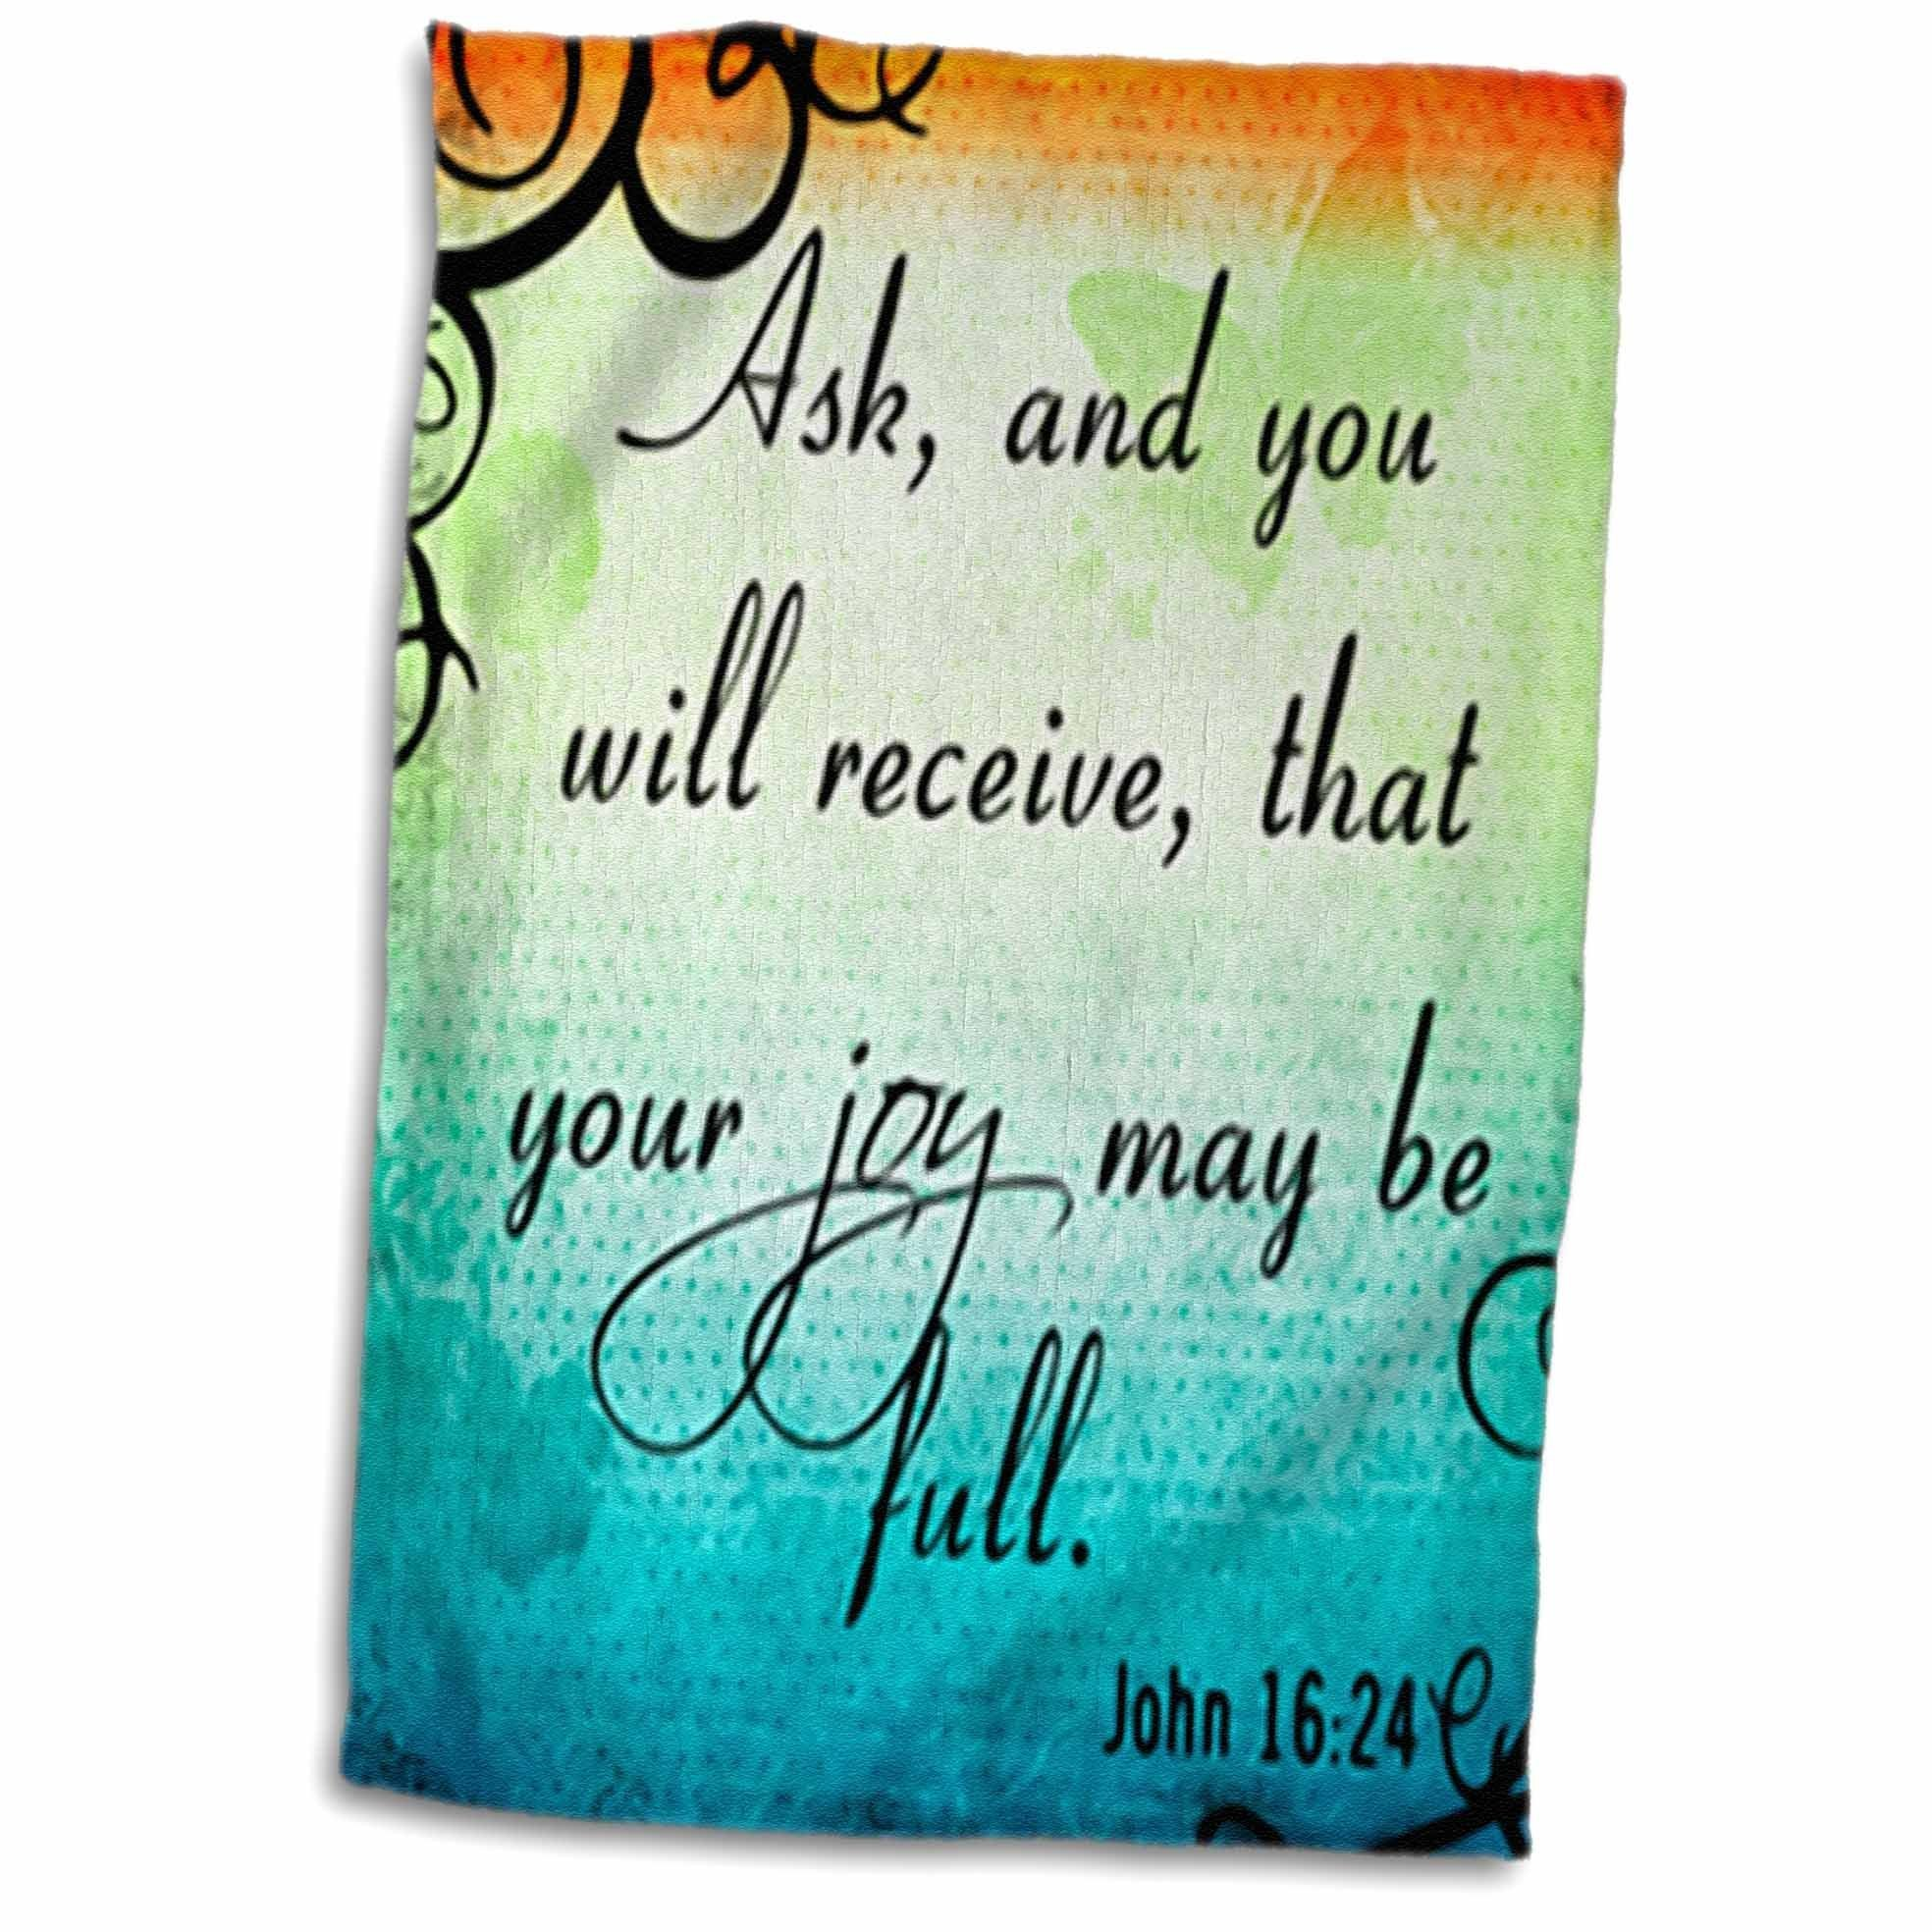 3D Rose Verse John 16-24 Gradient Vibrant Swirl Bible Christian Inspirational Saying Towel, 15'' x 22'', Multicolor